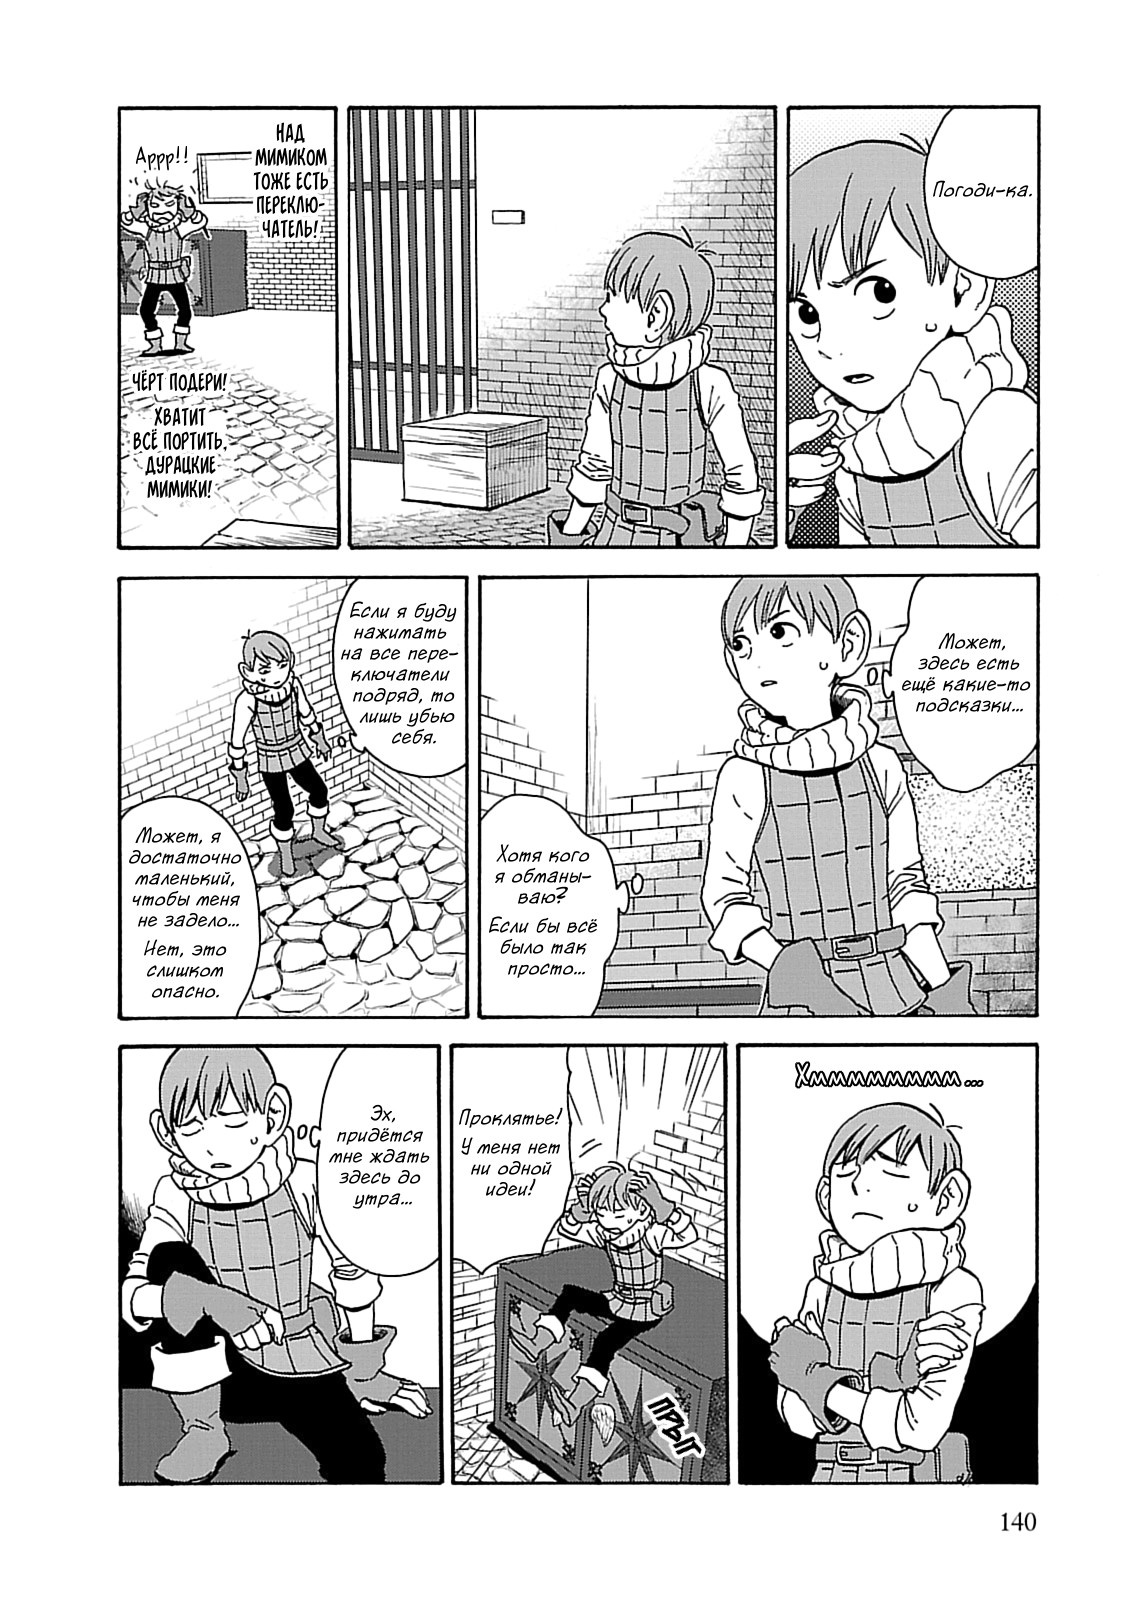 https://r1.ninemanga.com/comics/pic2/50/27634/314954/1482711938983.jpg Page 12